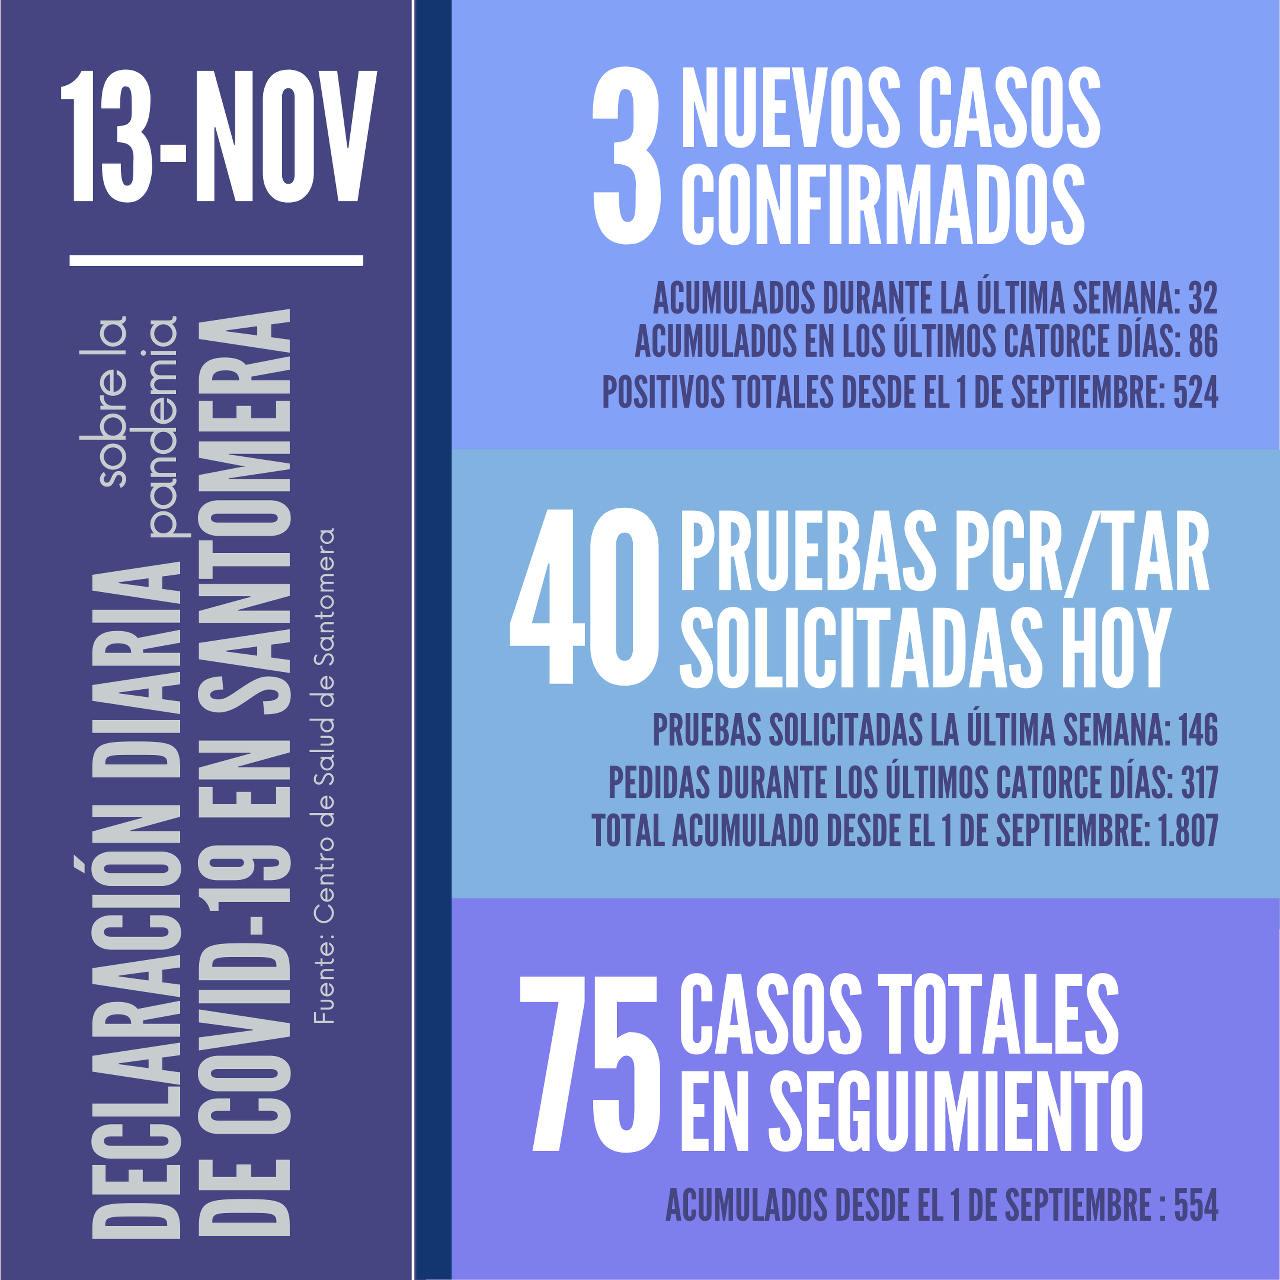 20201113_Datos COVID-19 Santomera